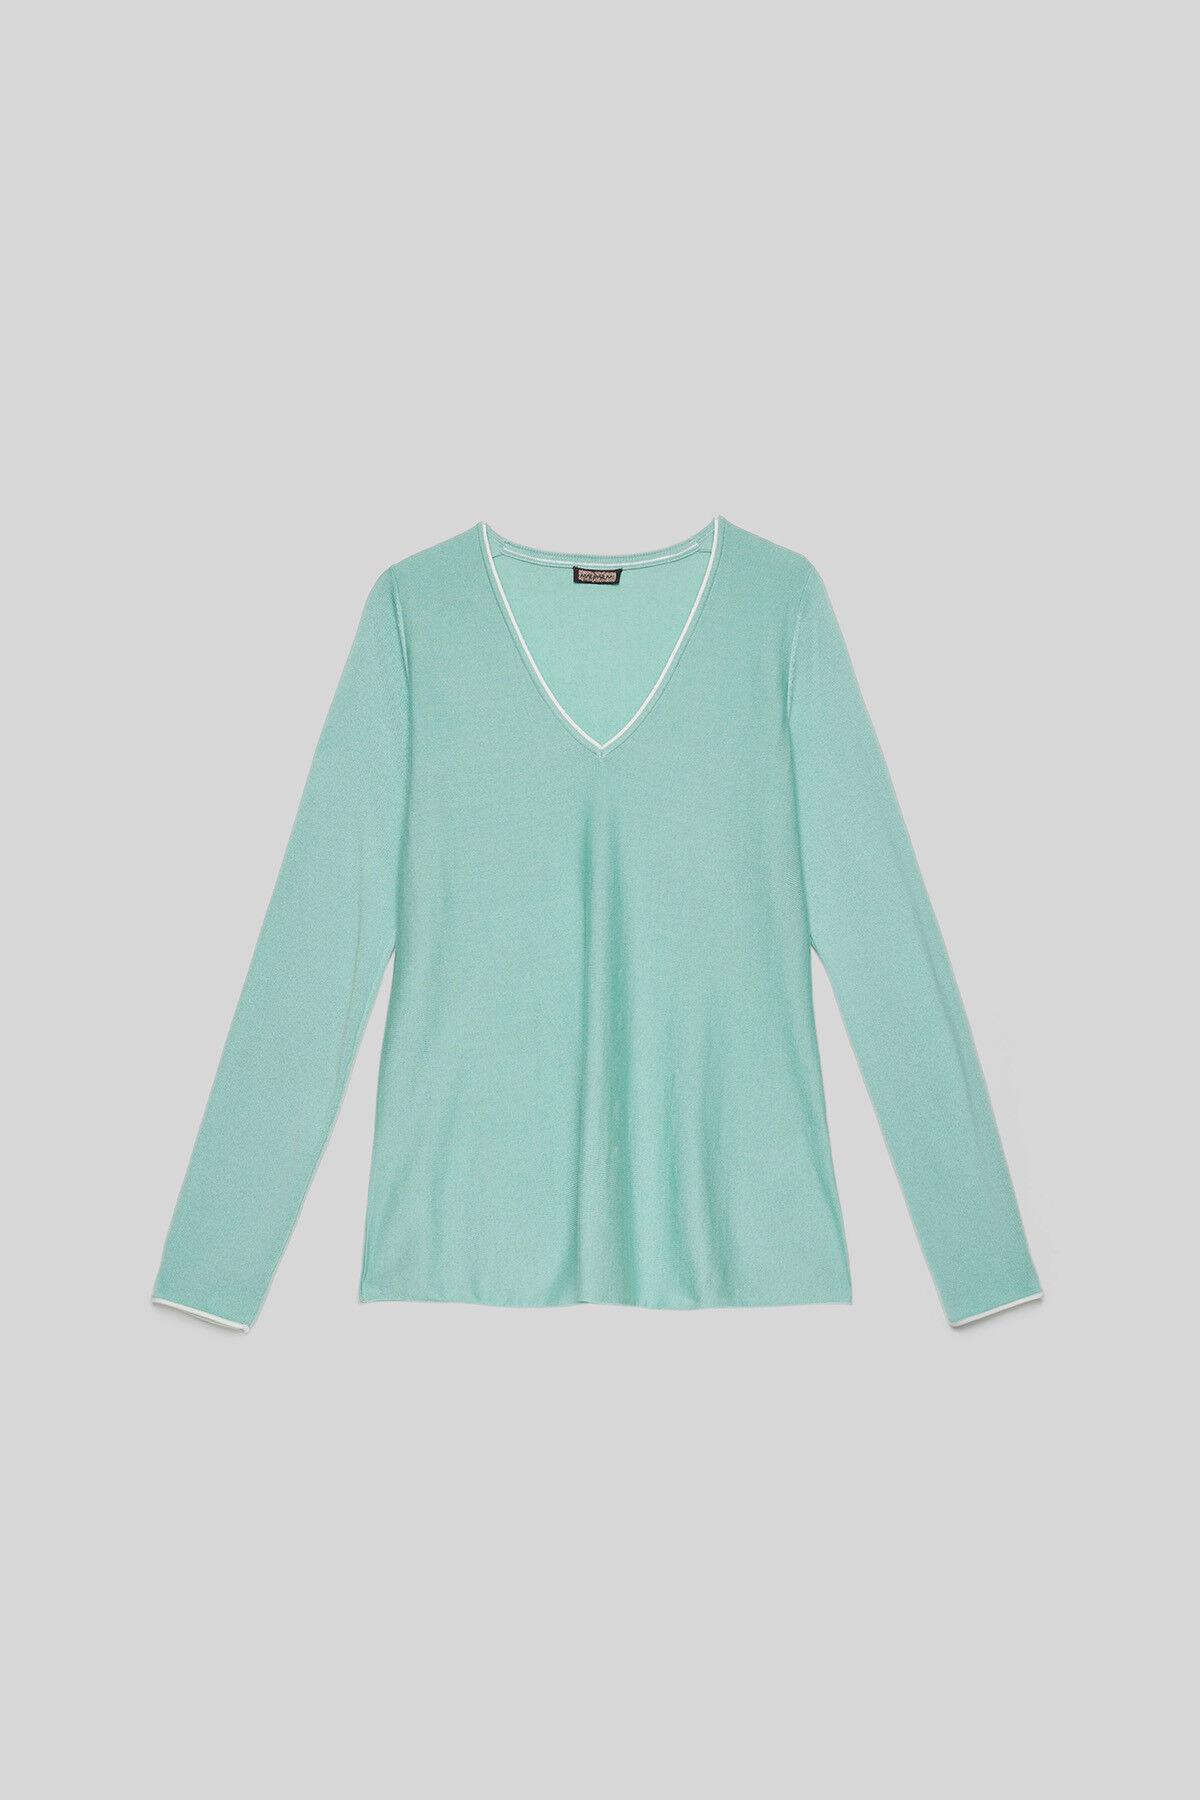 Smooth Spring Sweater - Maliparmi